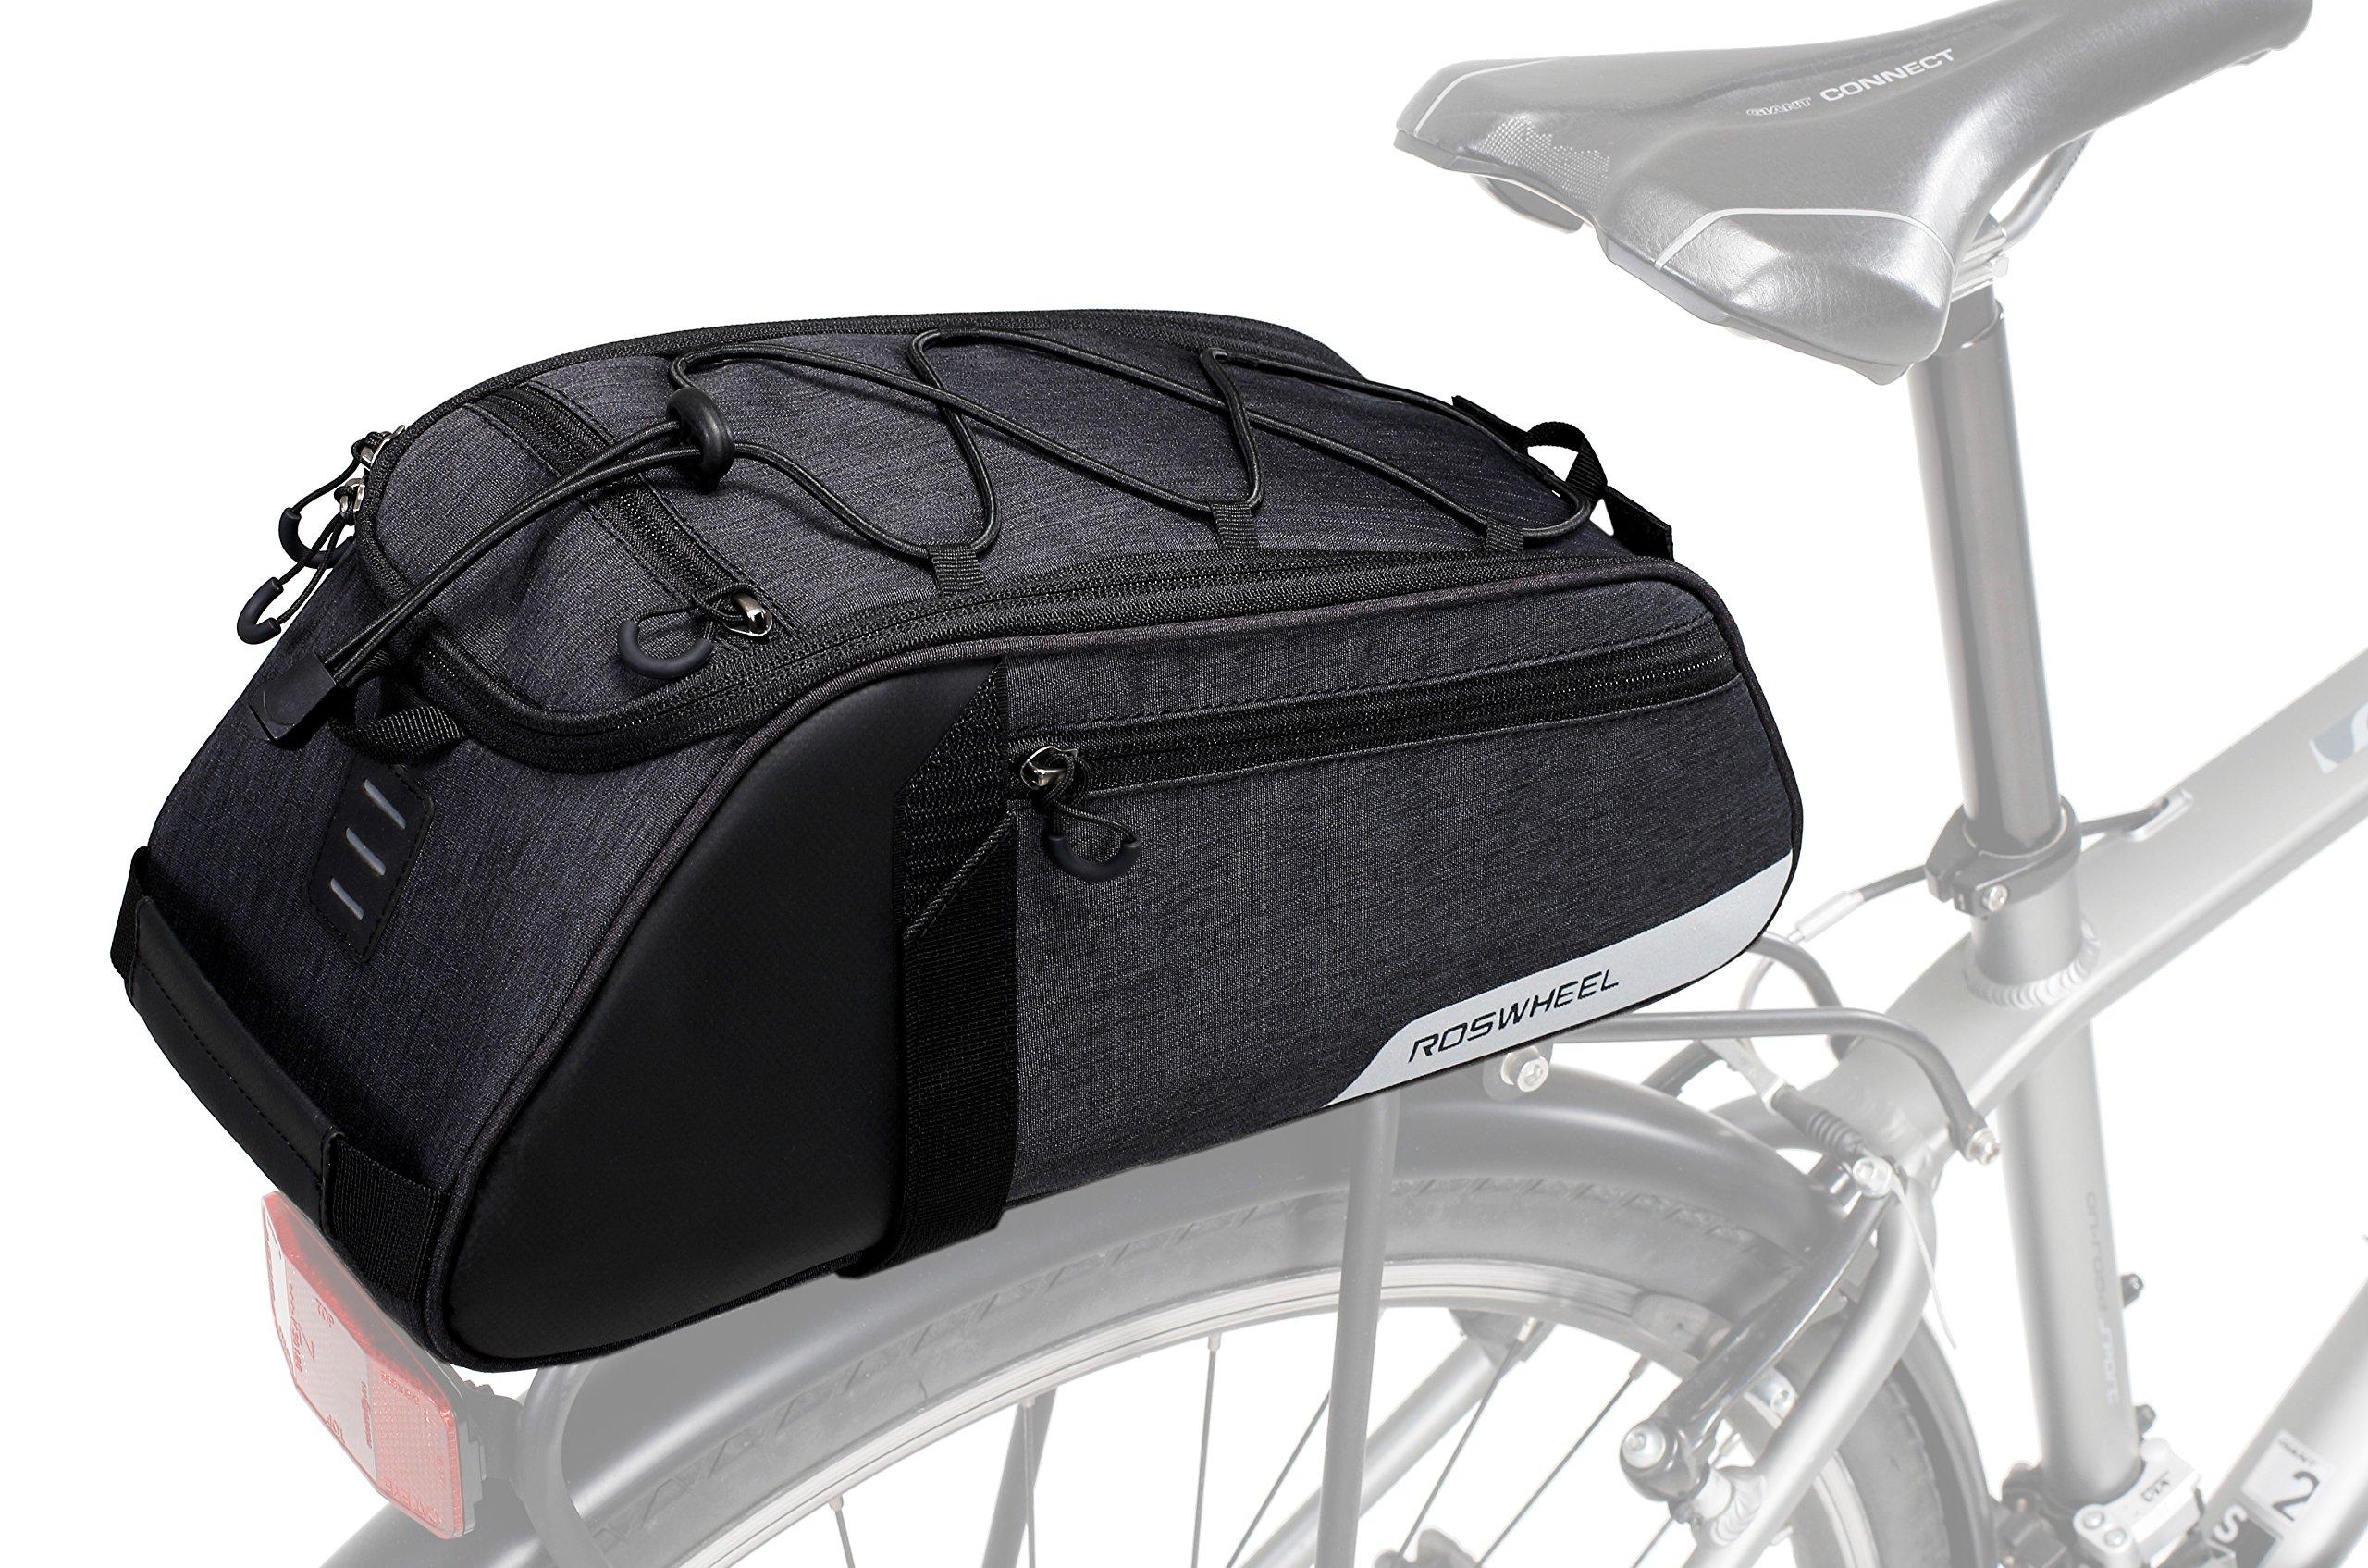 Roswheel Essentials Series 141466 Bike Trunk Bag Bicycle Rear Rack Pack Cycling Accessories Pannier, 8L Capacity